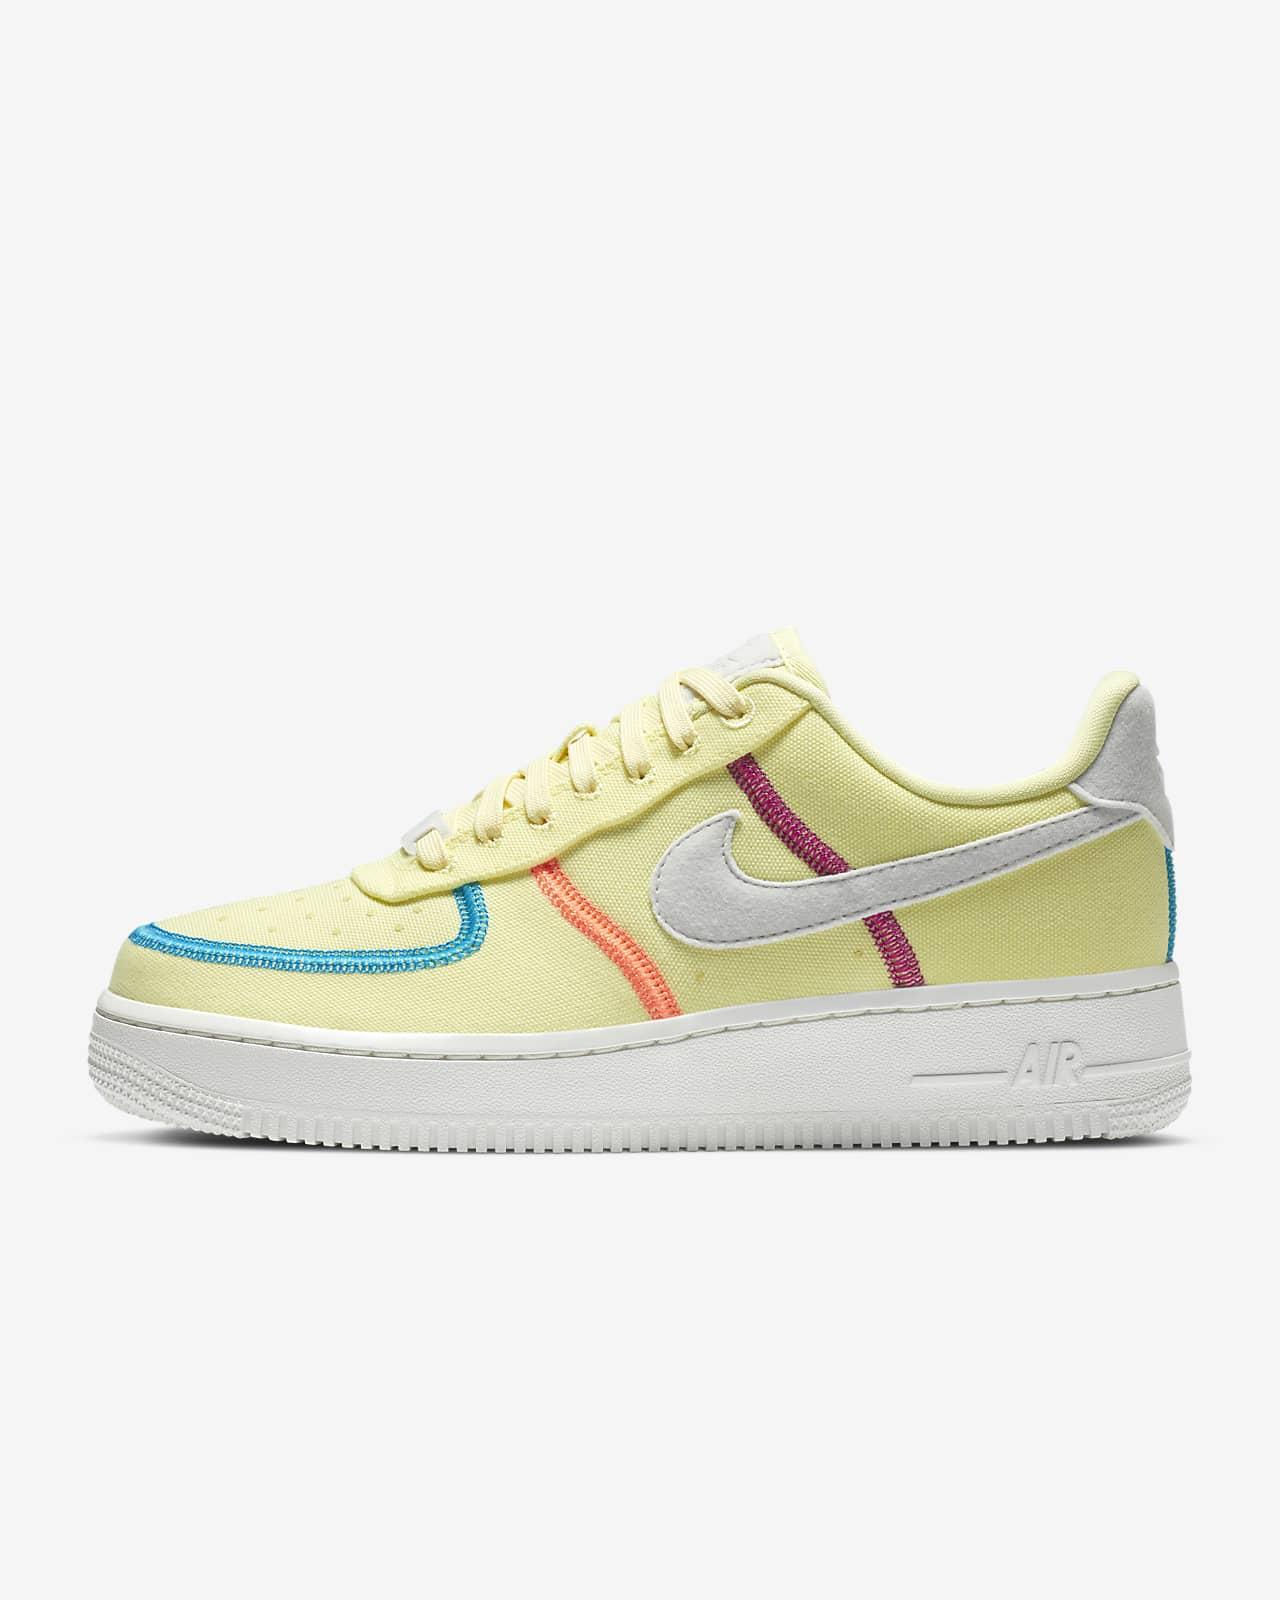 Nike Air Force 1 '07 LX Schuhe für Damen